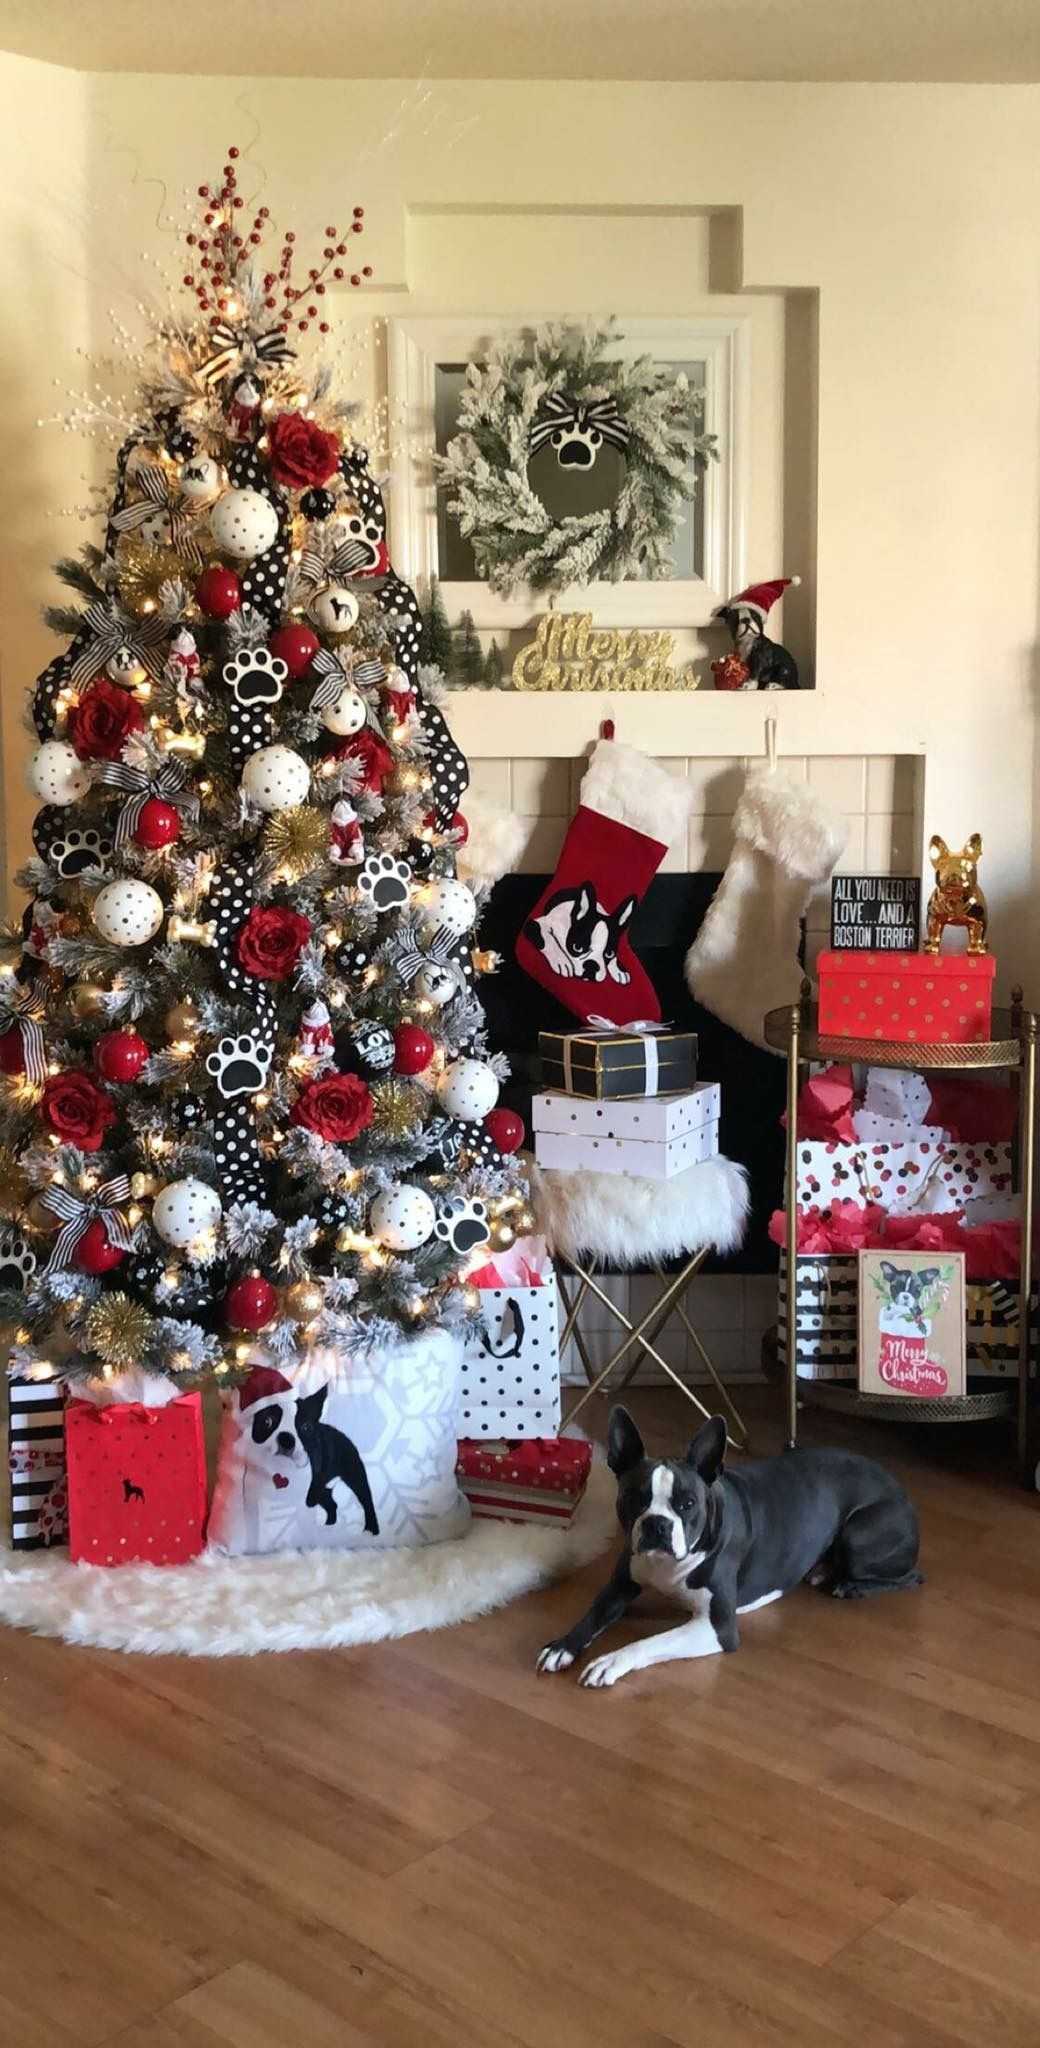 Pin By Nikey Mattson On Boston Terriers Christmas Tree Dog Boston Terrier Christmas Dog Tree